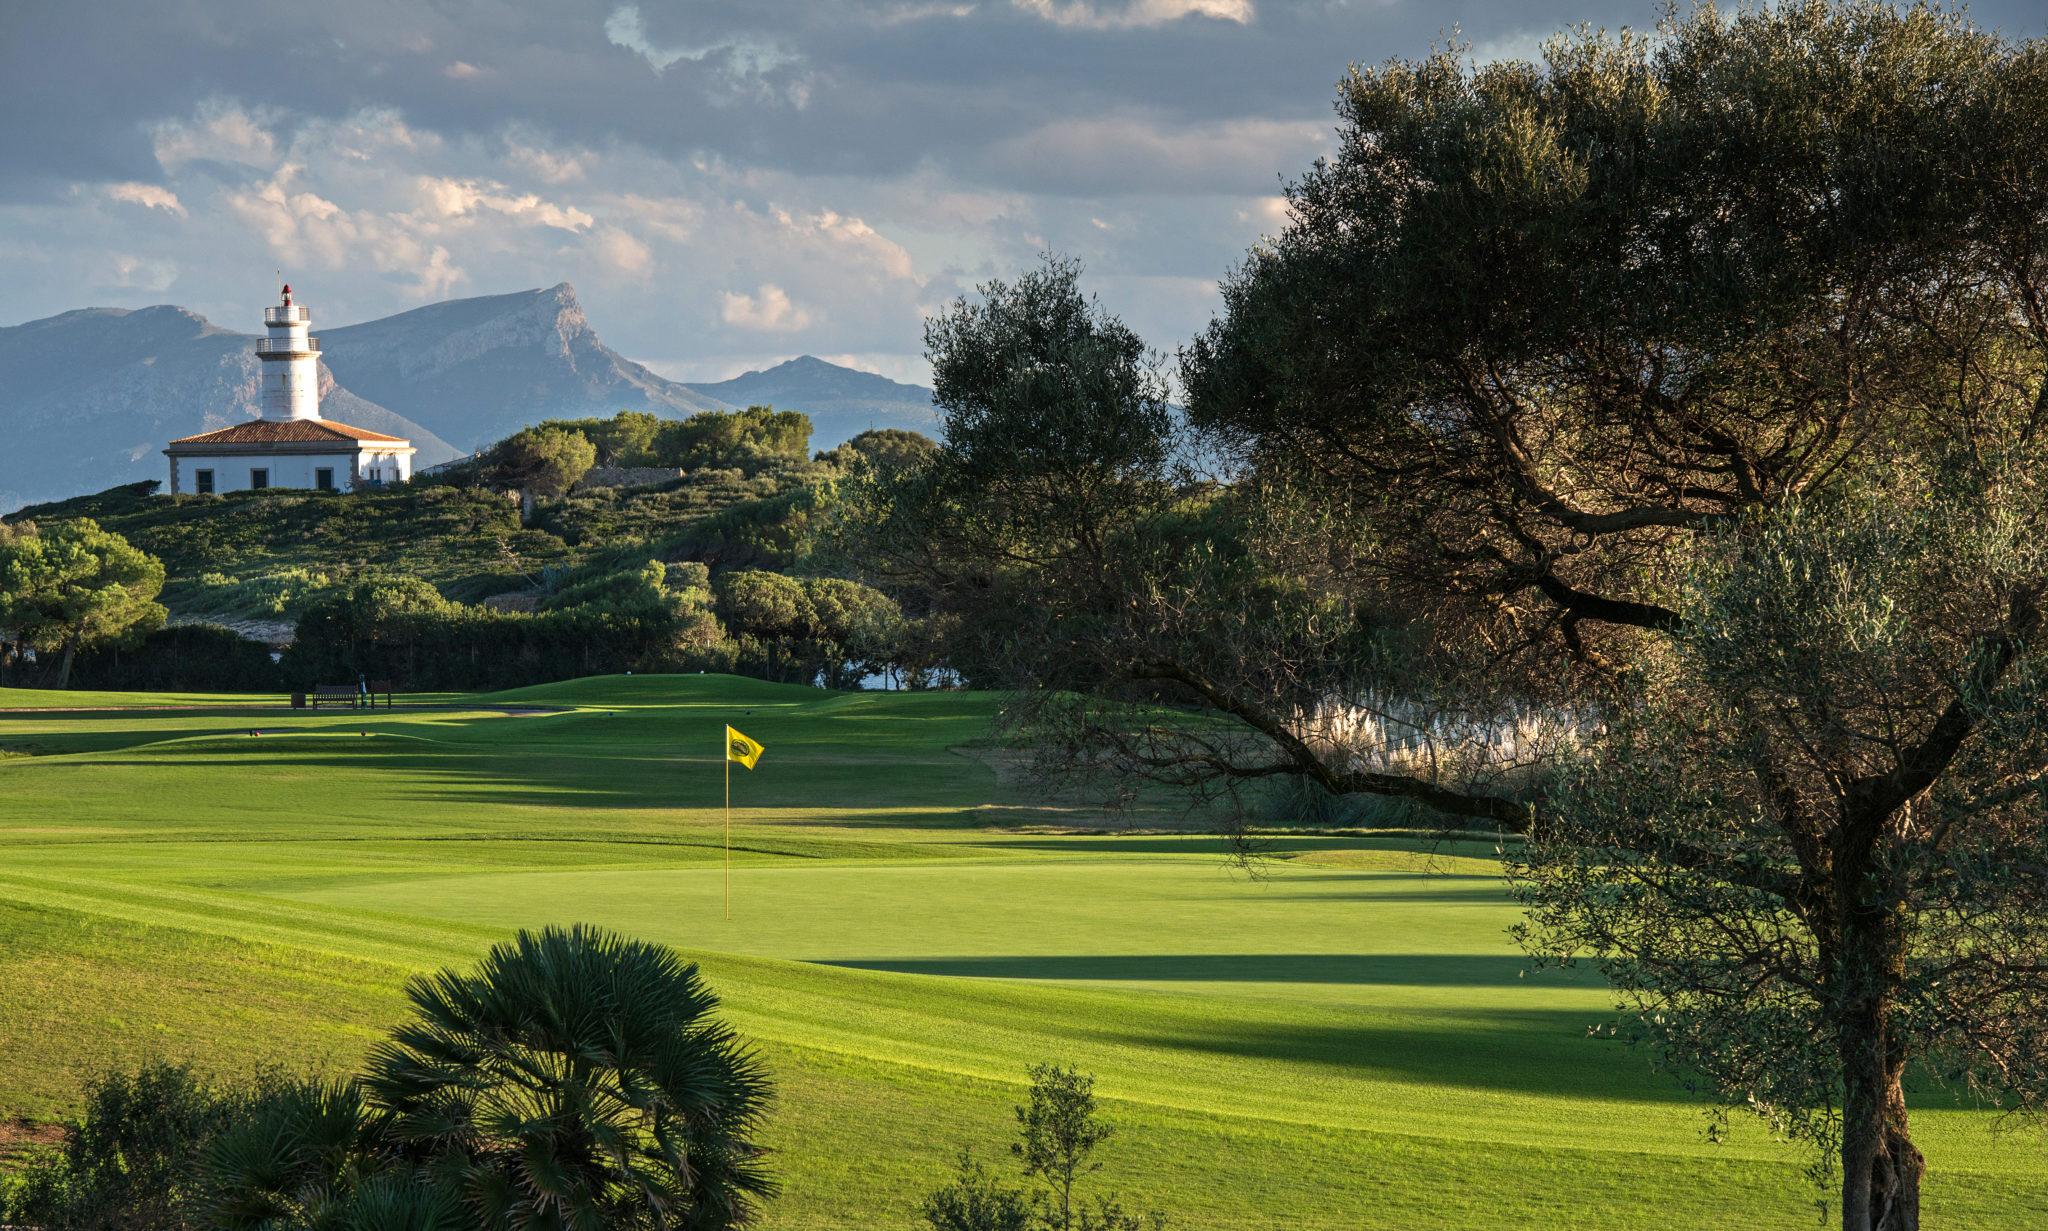 Club de Golf Alcanada mallorca 02